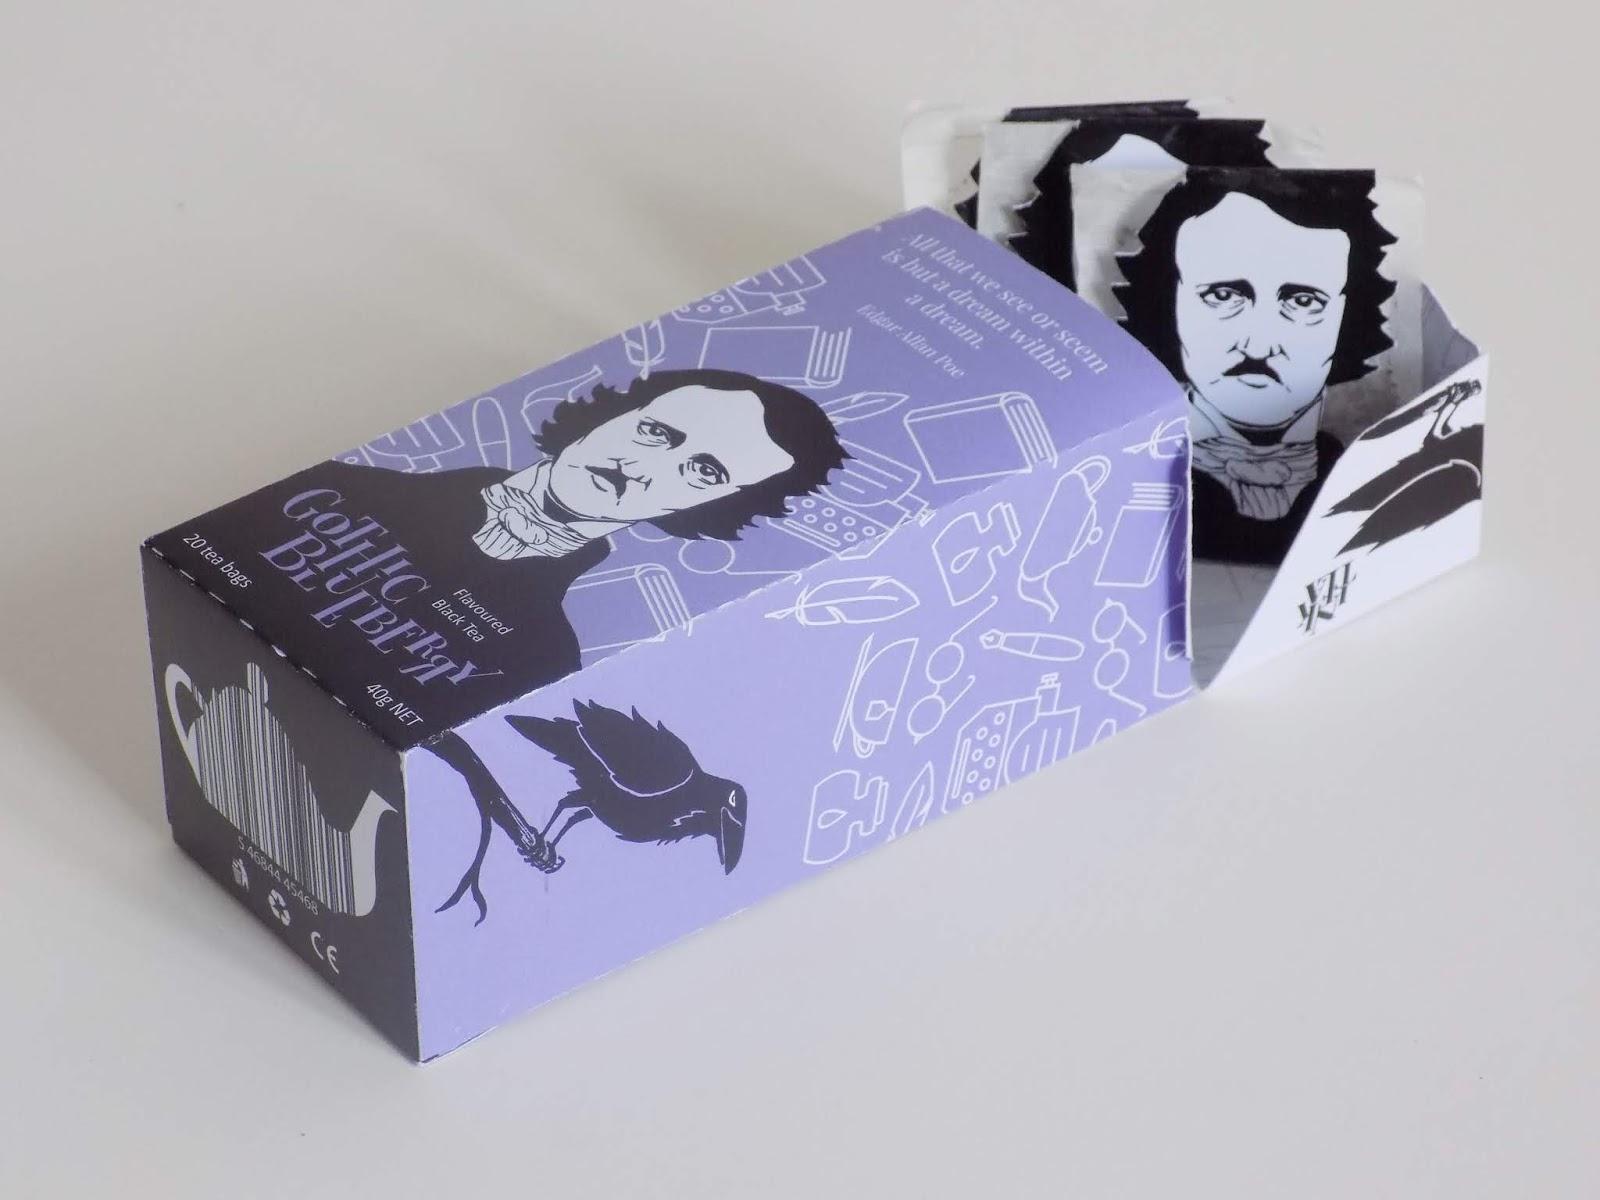 "InkTea (thé ""spécial lecteurs"") I Design (projet étudiant) : Agata Wilczynska (Corvin Artschool), Budapest, Hongrie (octobre 2018)"